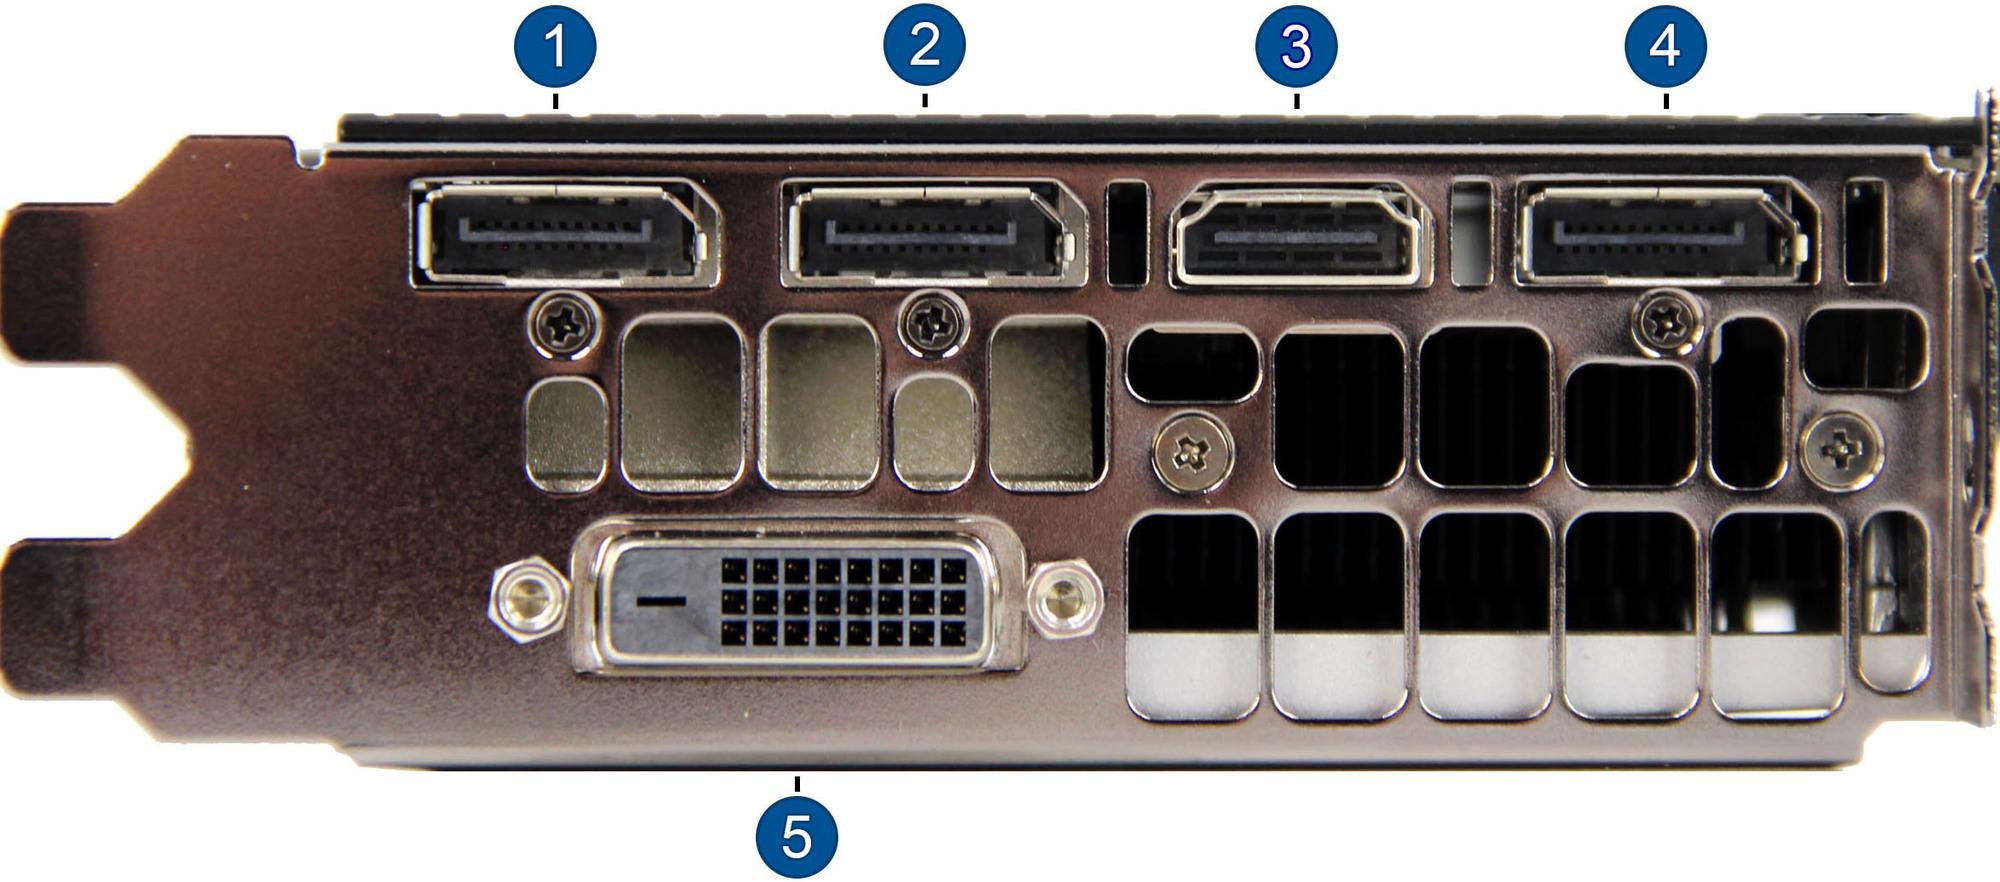 Configure PC w/ EVGA GeForce GTX 1060 6GB Video Card